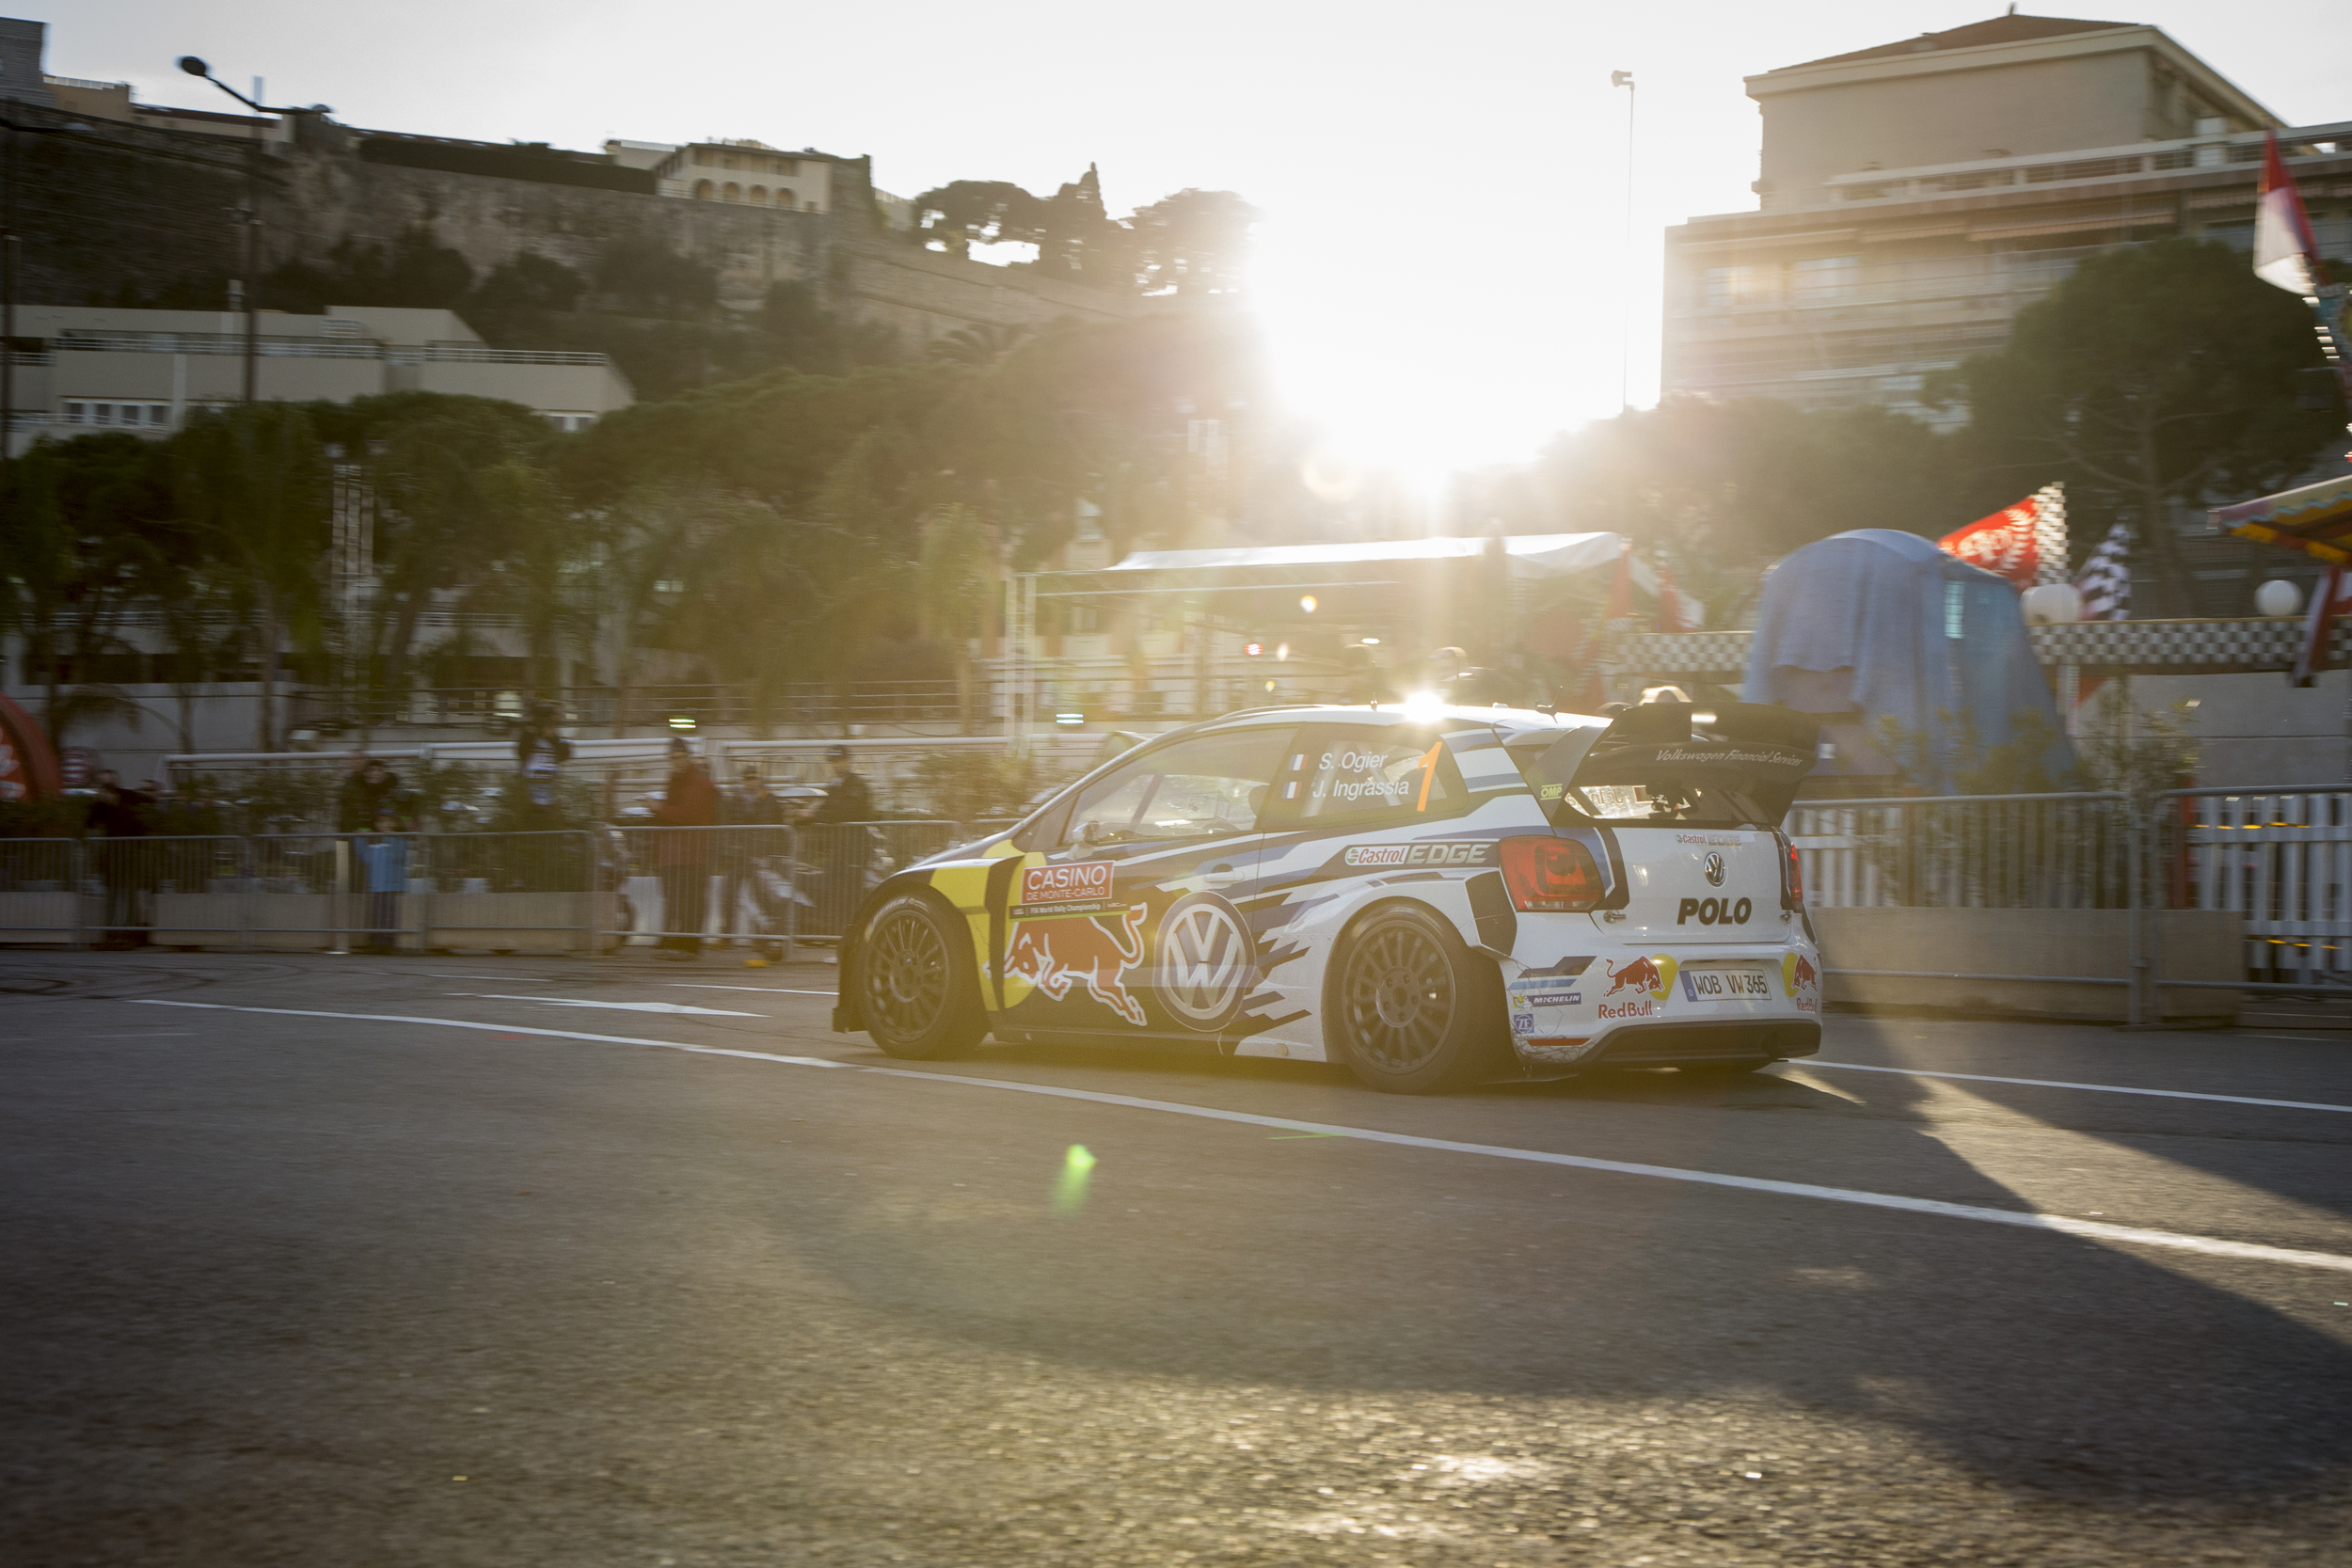 Port Hercule Monaco -WRC show 2015